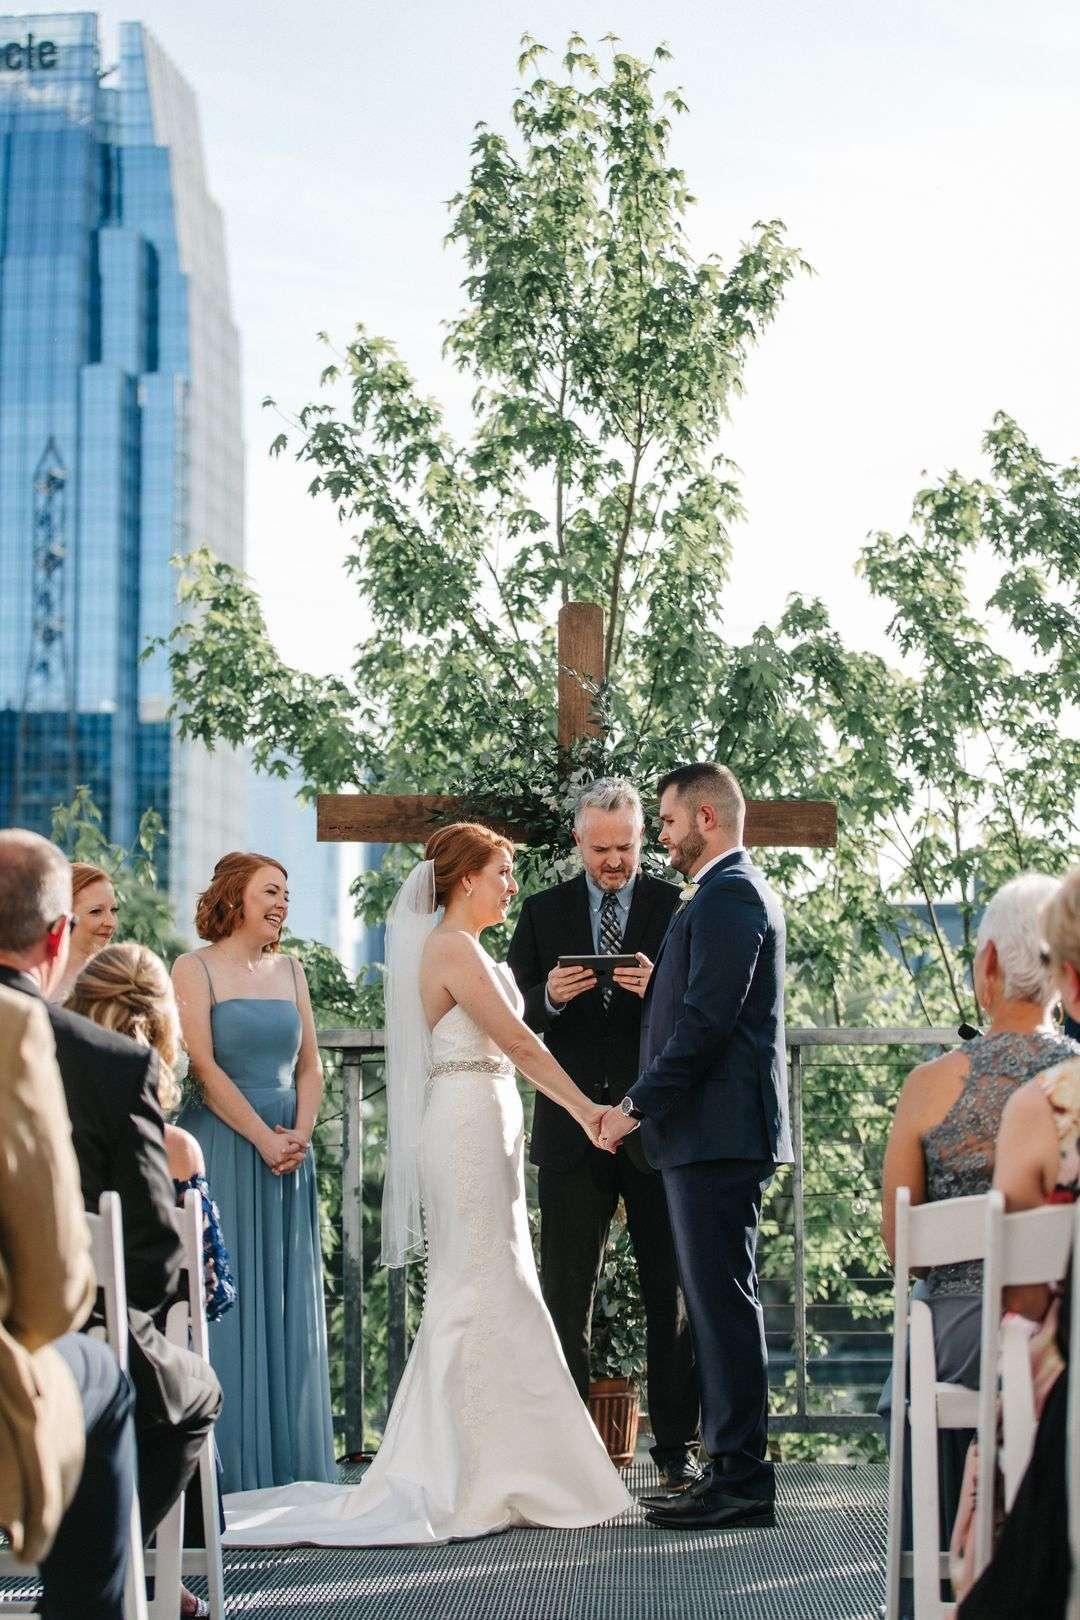 outdoor wedding in downtown nashville